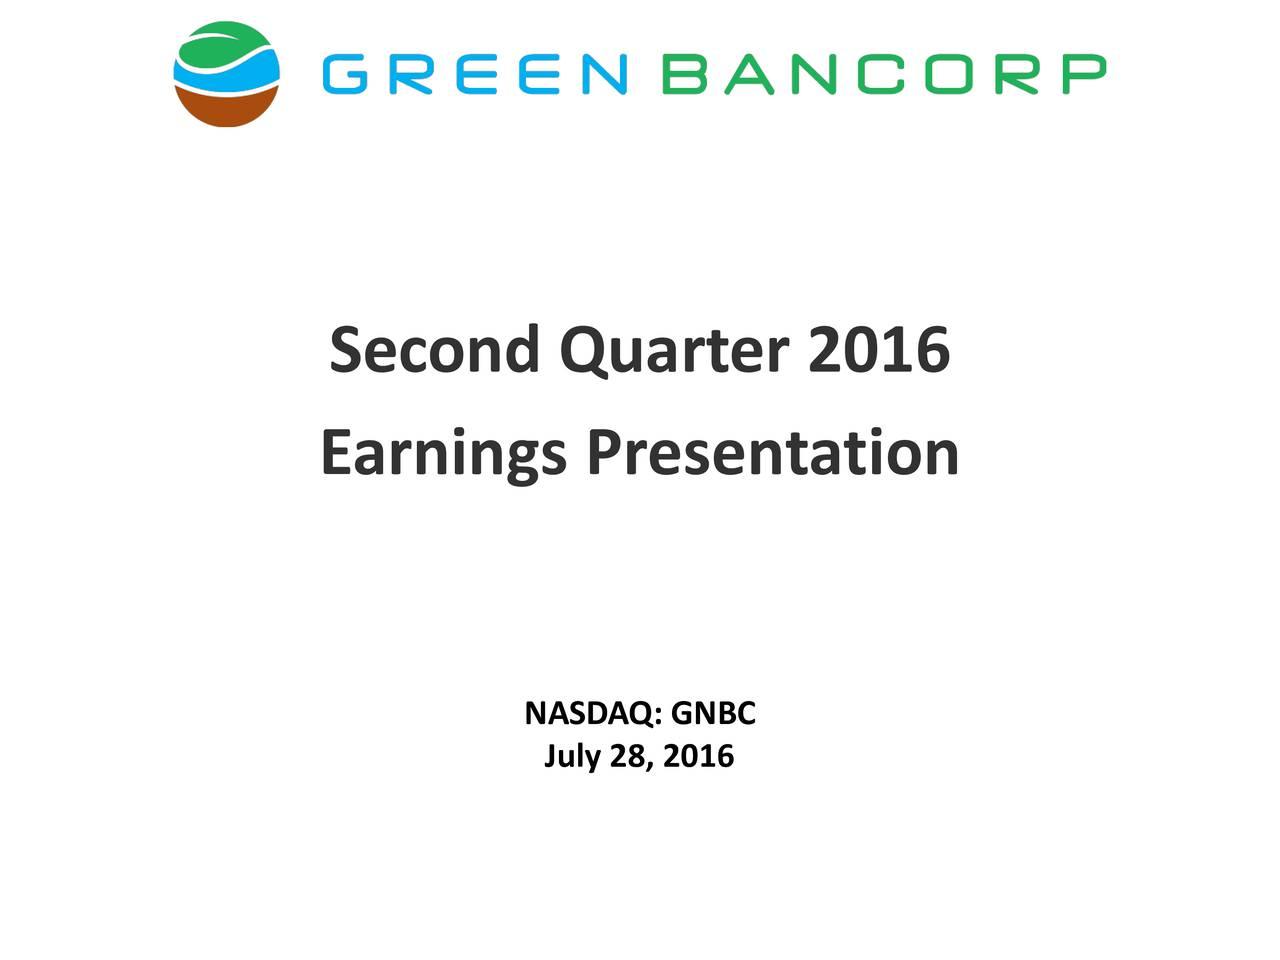 Earnings Presentation NJuly 28, 2016